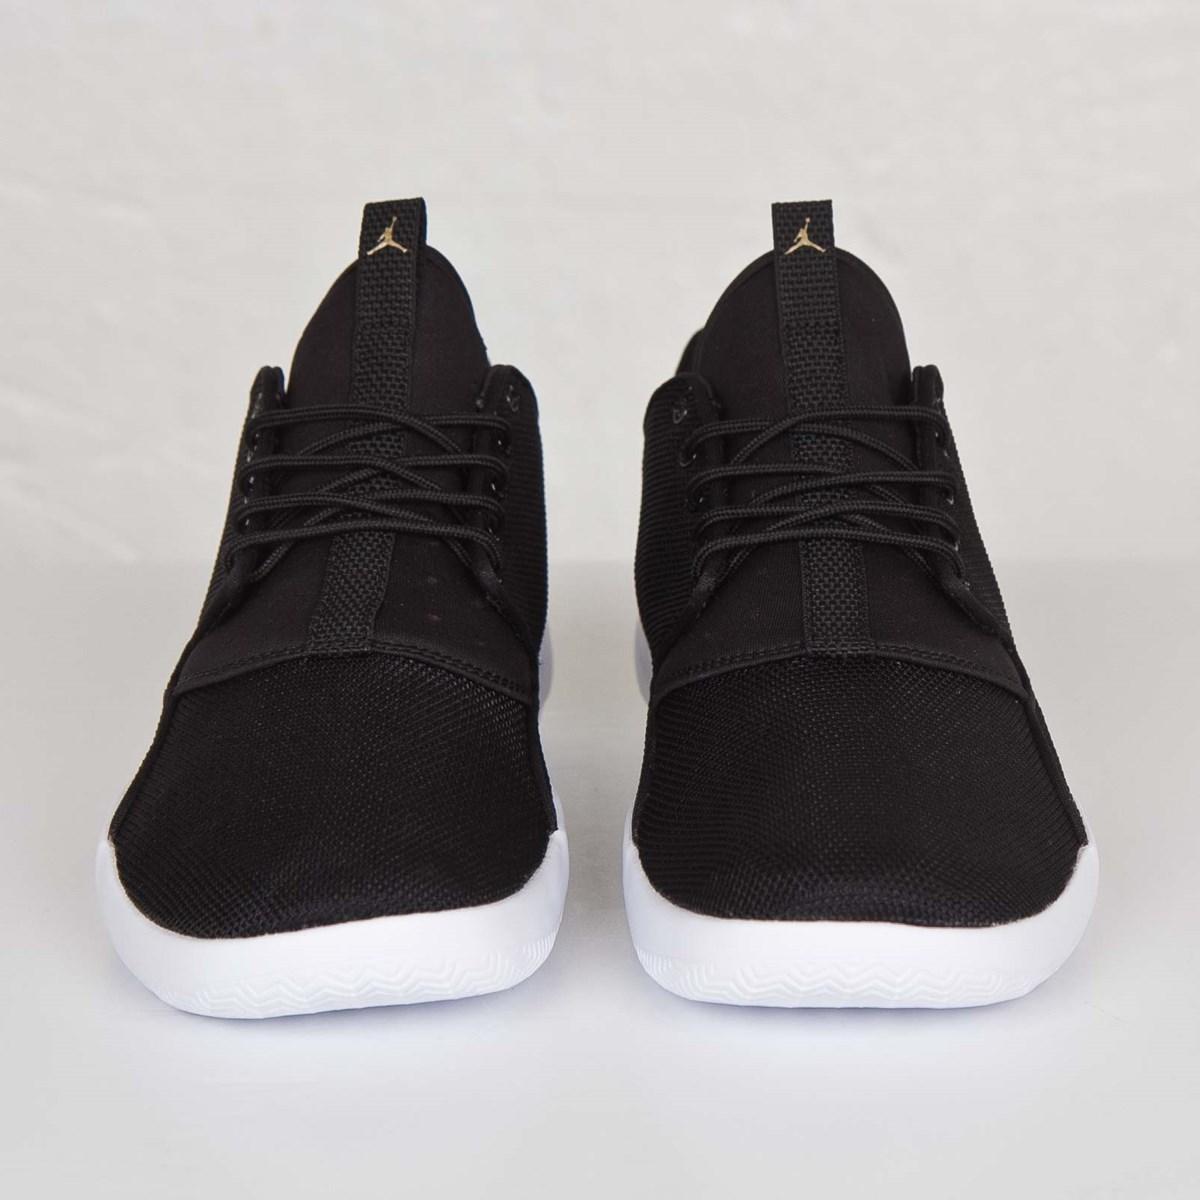 online retailer ea7a8 c1473 ny jordan eclipse rød svart hvit joggesko herre salg  jordan brand jordan  eclipse 724010 014 sneakersnstuff sneakers streetwear online since 1999